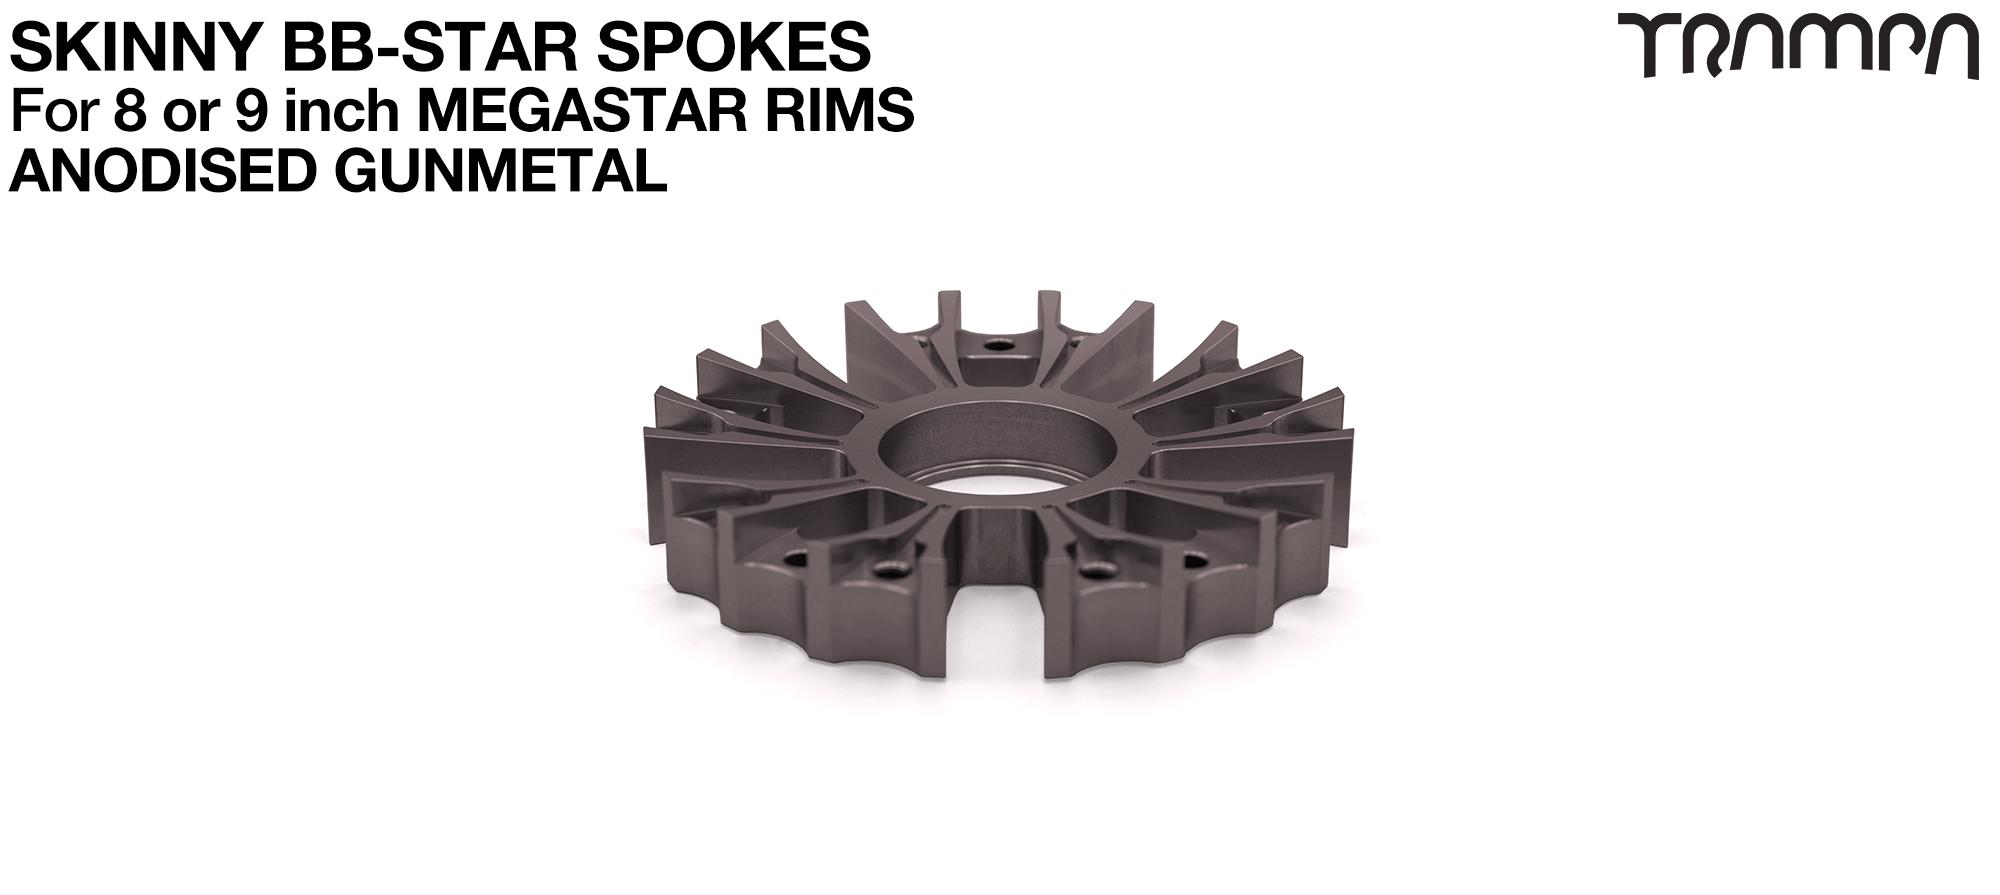 BB Star Spoke for 8 Inch DEEP-DISH MEGASTAR Rim - CNC Precision milled - GUNMETAL